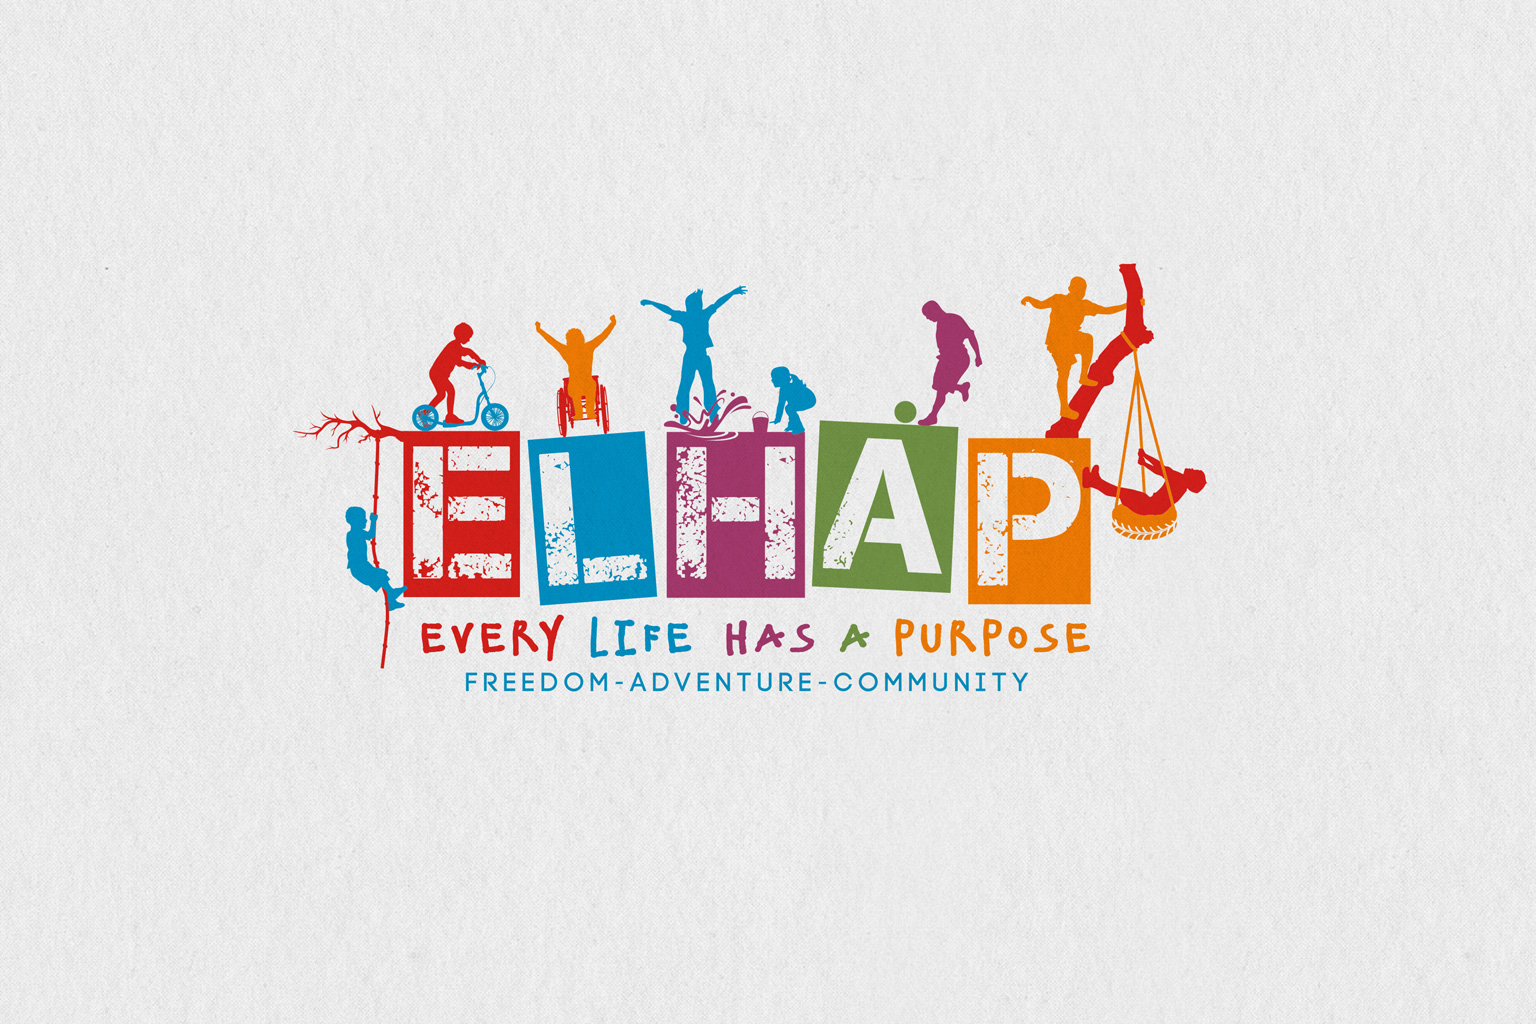 elhap-logo